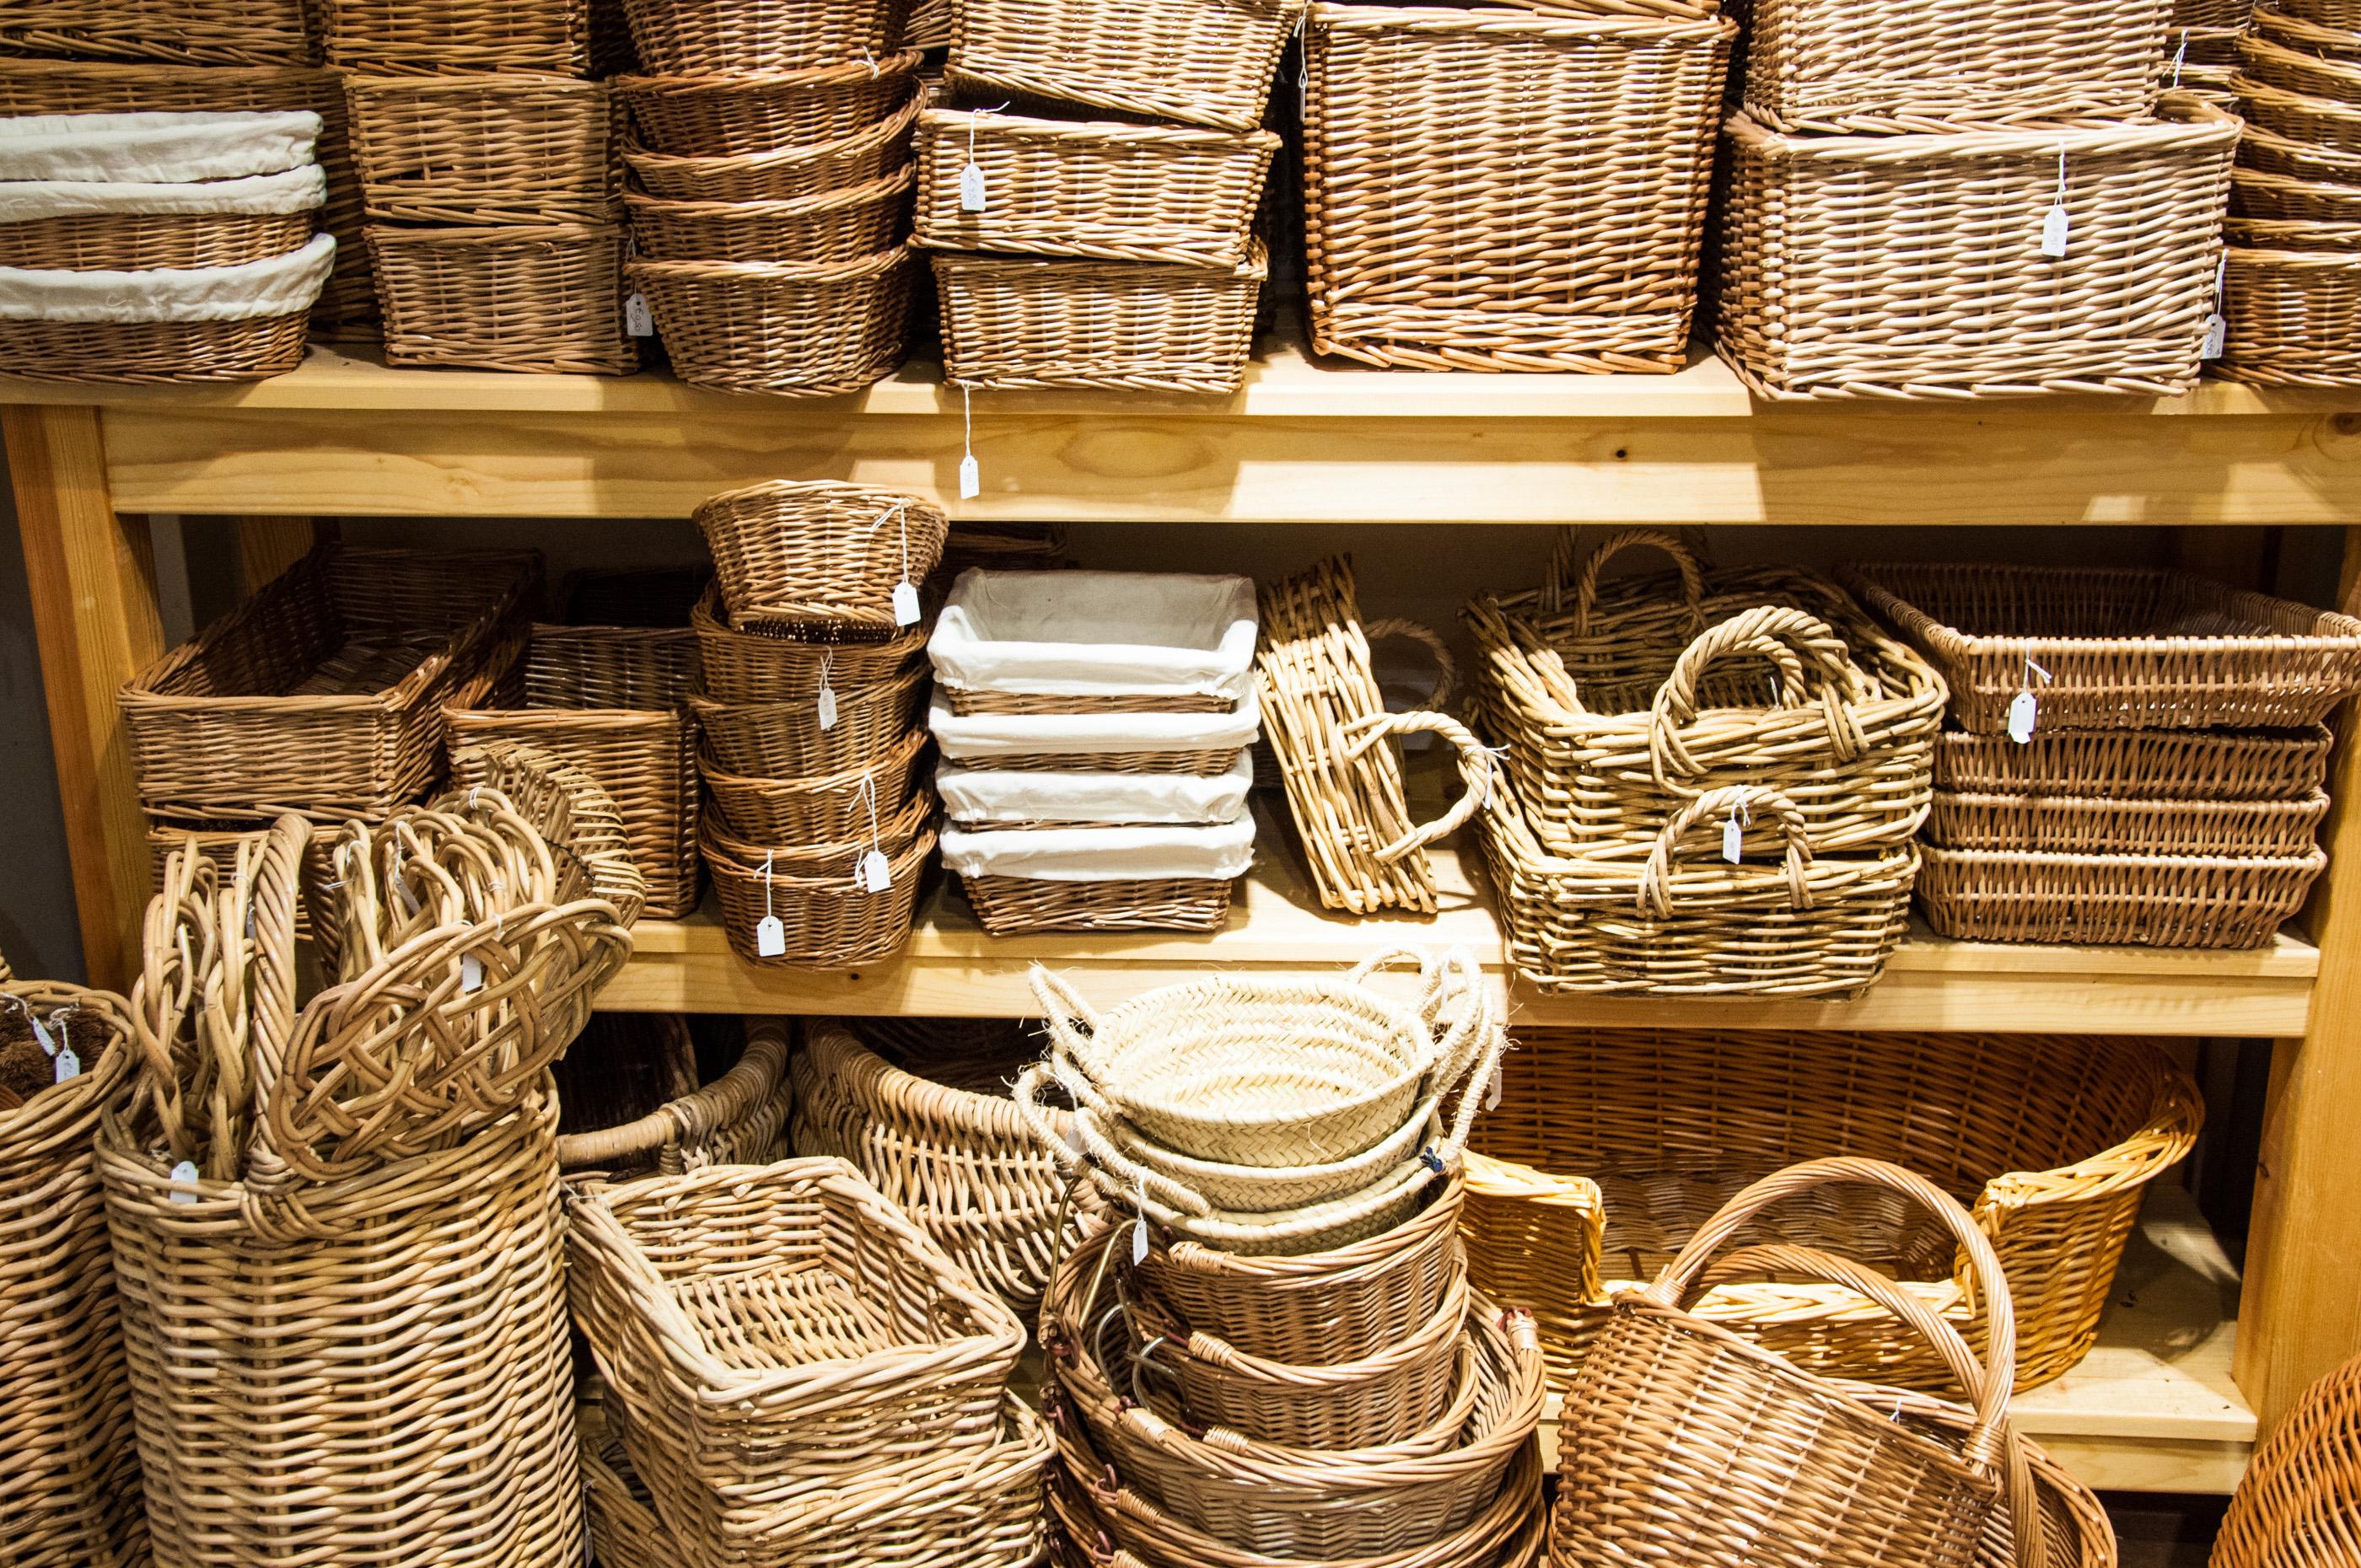 Bamboo rotan baskets photo